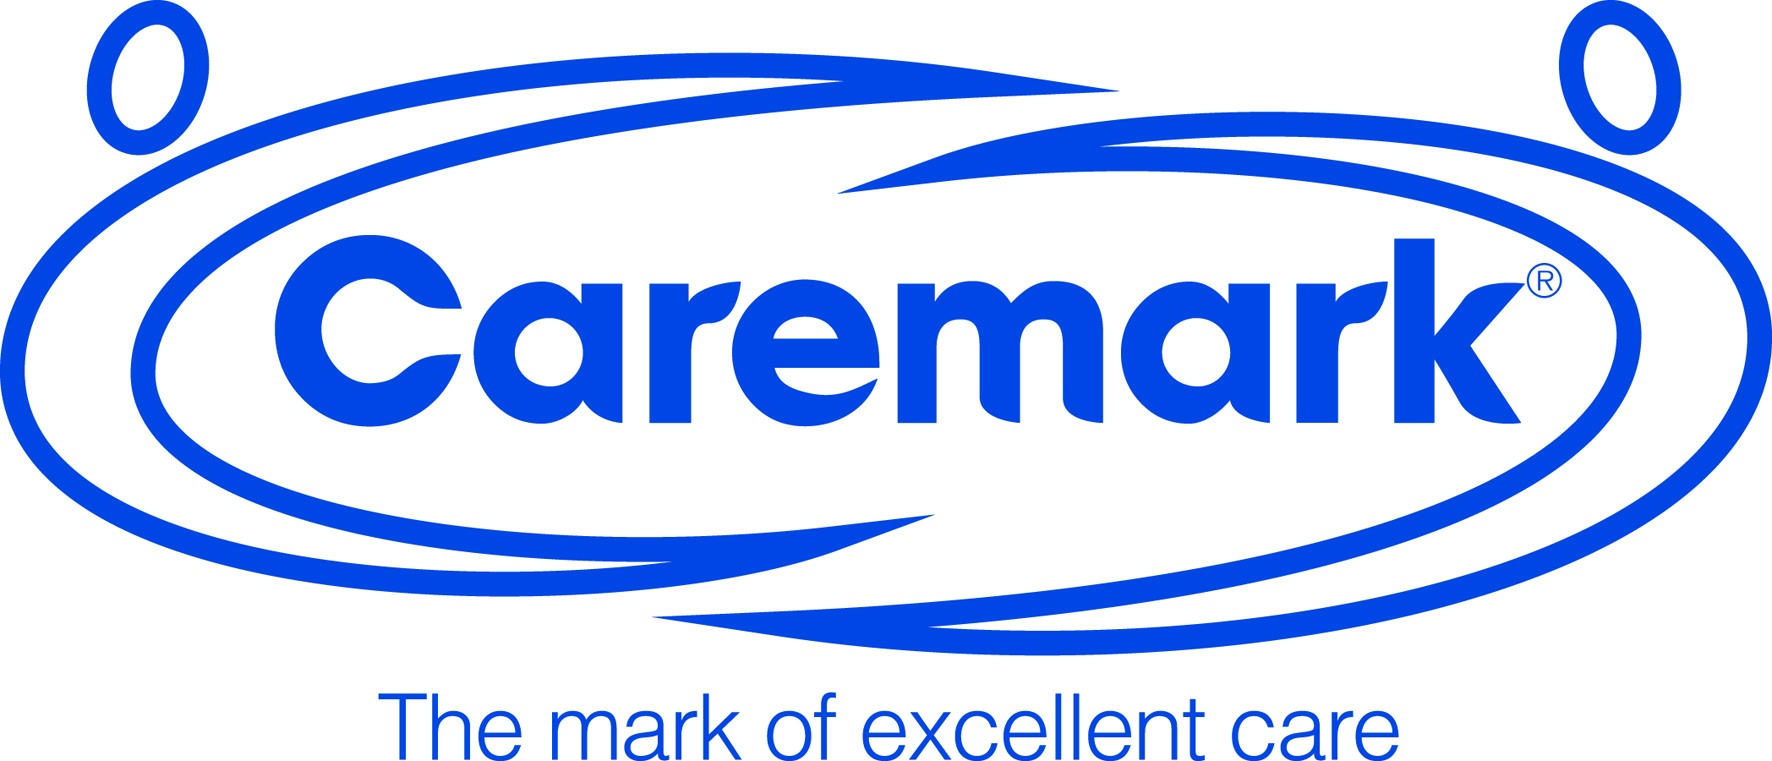 Caremark (Slough & South Bucks)